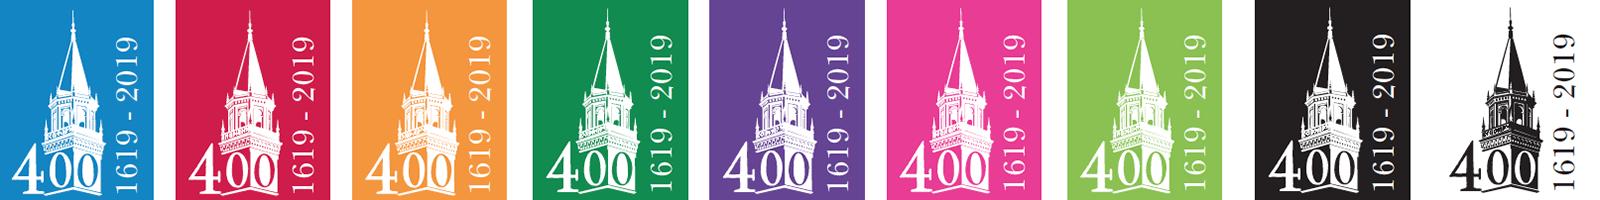 Dulwich College 400 Years logo